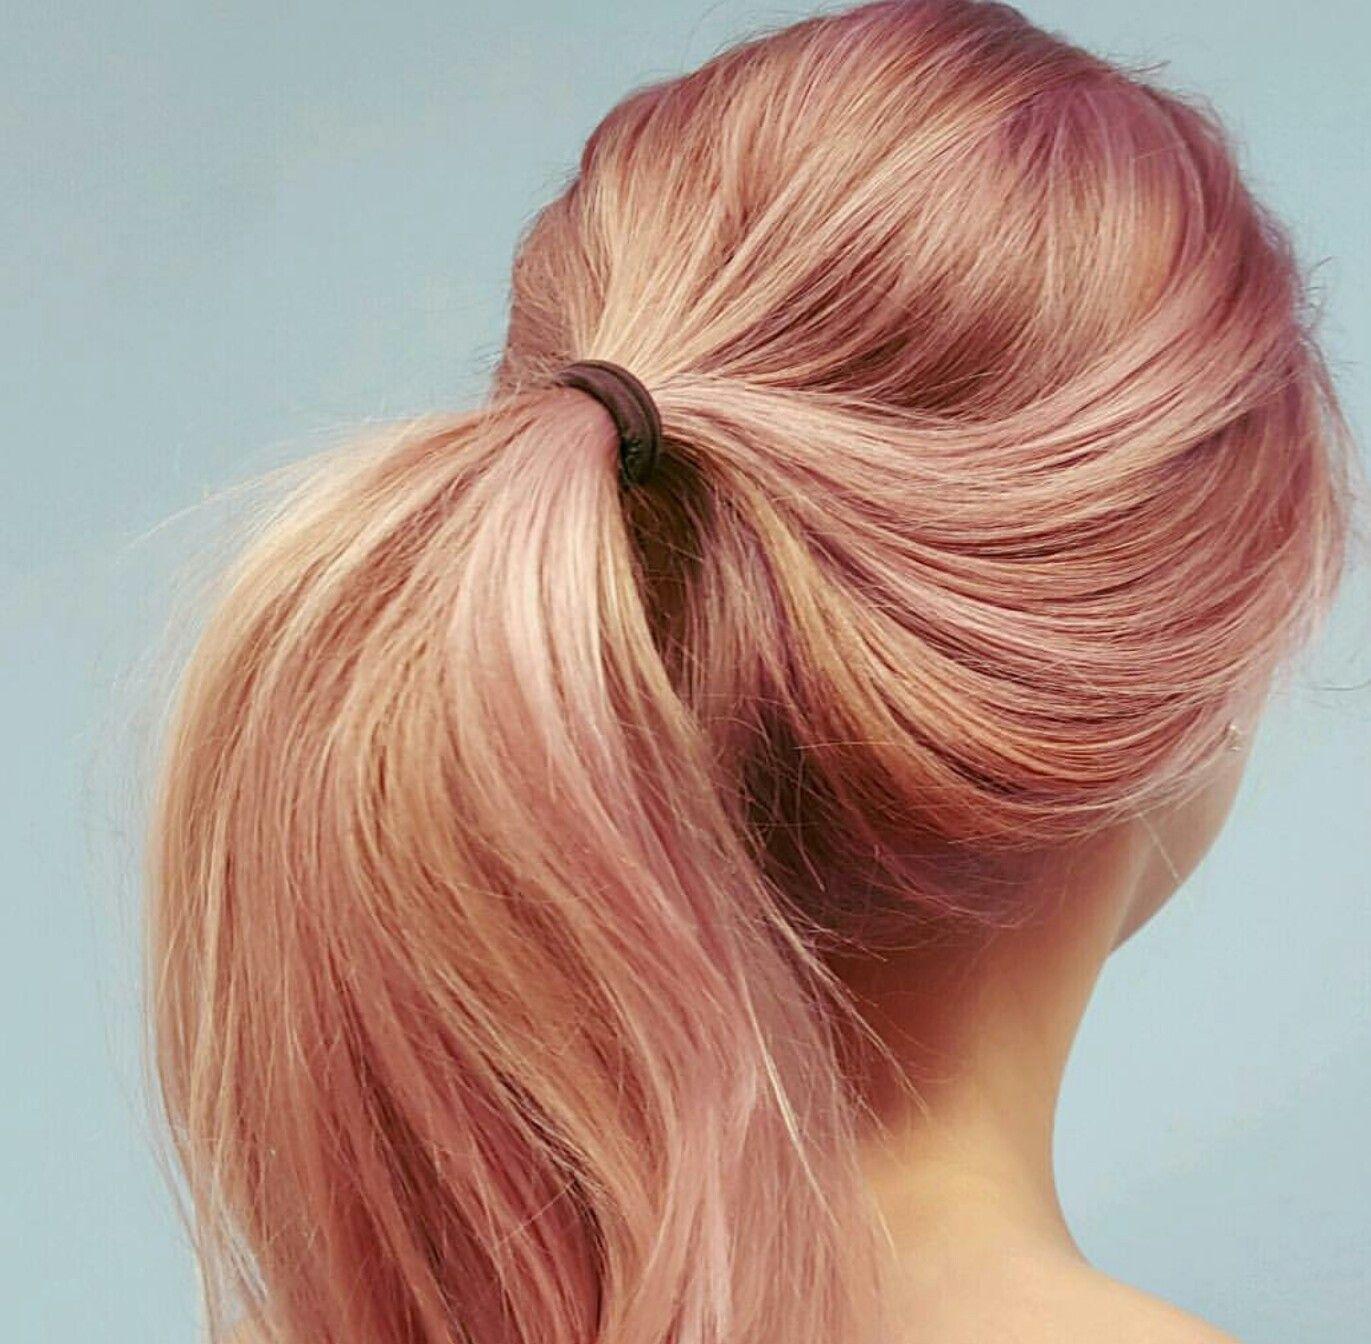 Peachy rosegoldlove  hair  Pinterest  Hair coloring Hair